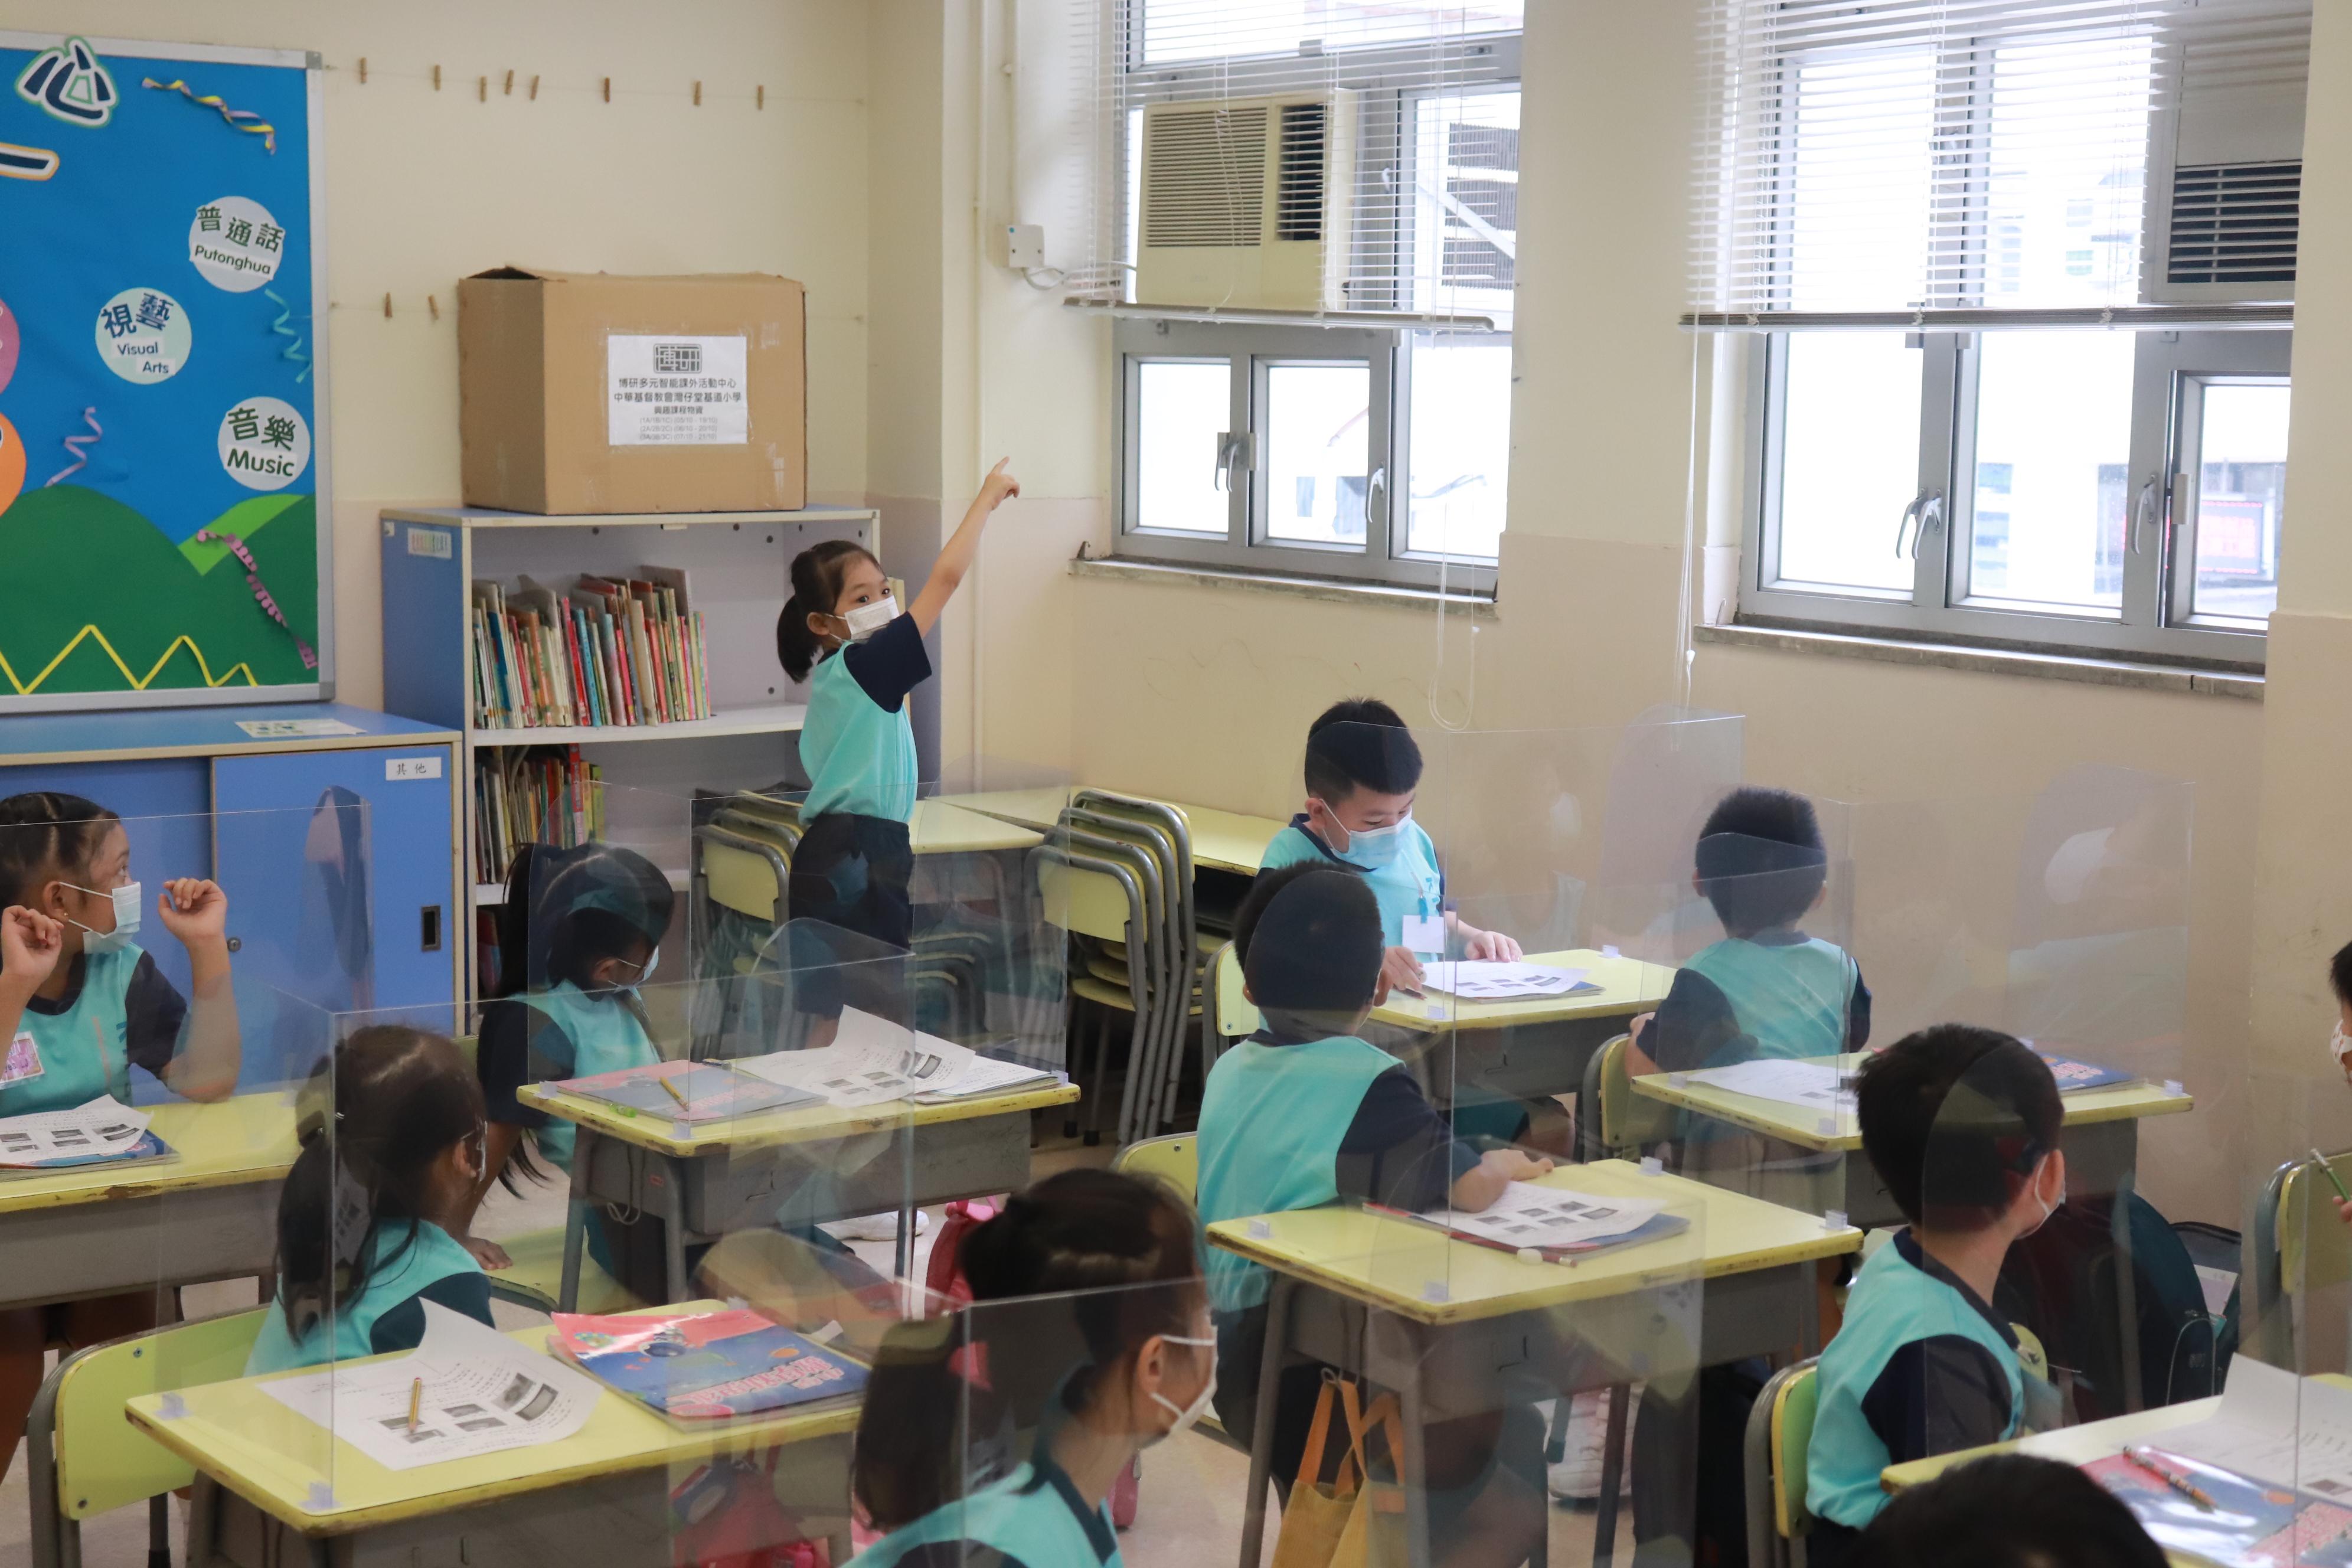 http://keito.school.hk/sites/default/files/img_6184.jpg